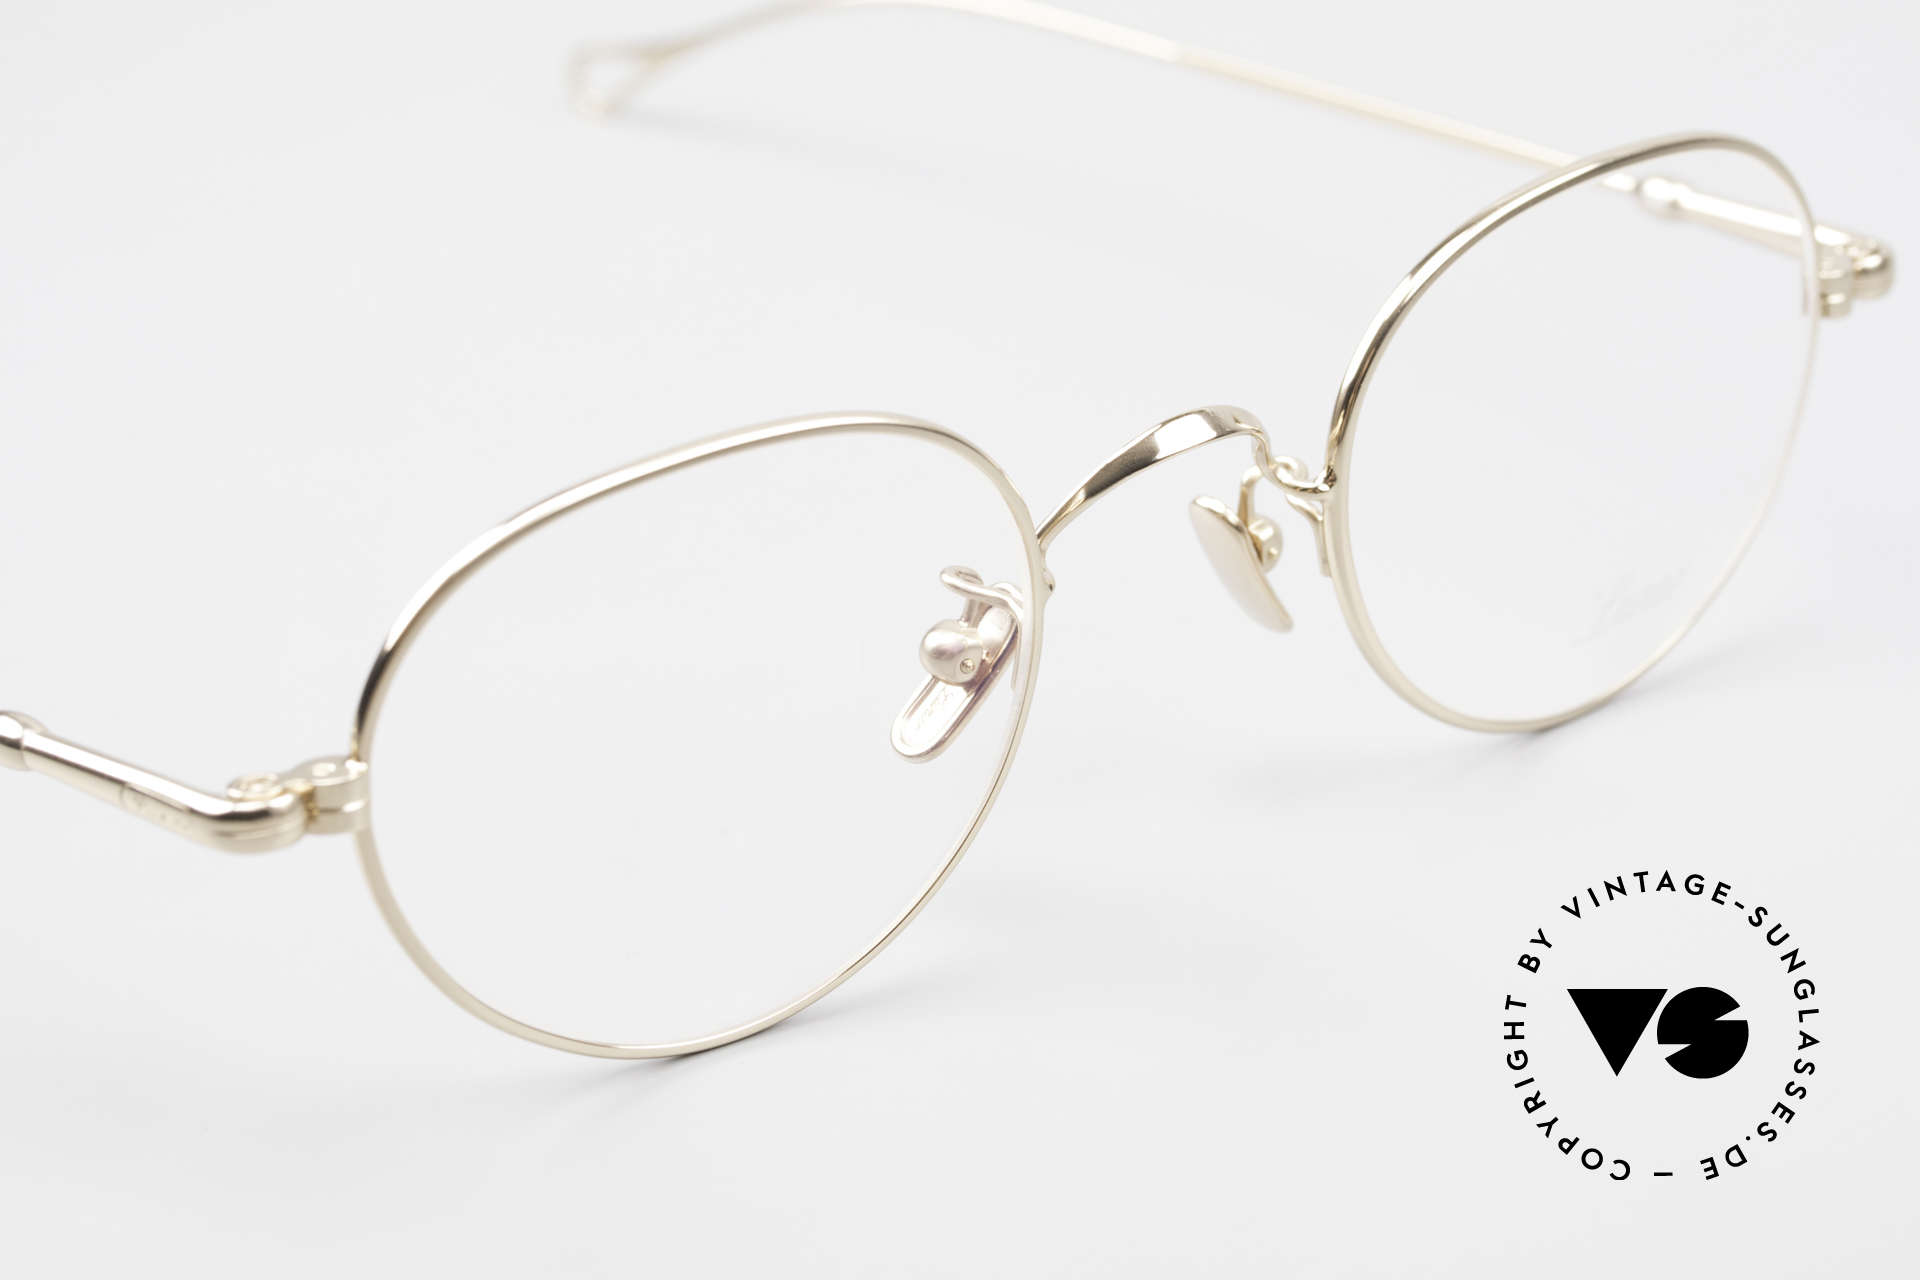 Lunor V 108 Gold Plated Glasses Titanium, of course, an unworn original with pure titanium pads, Made for Men